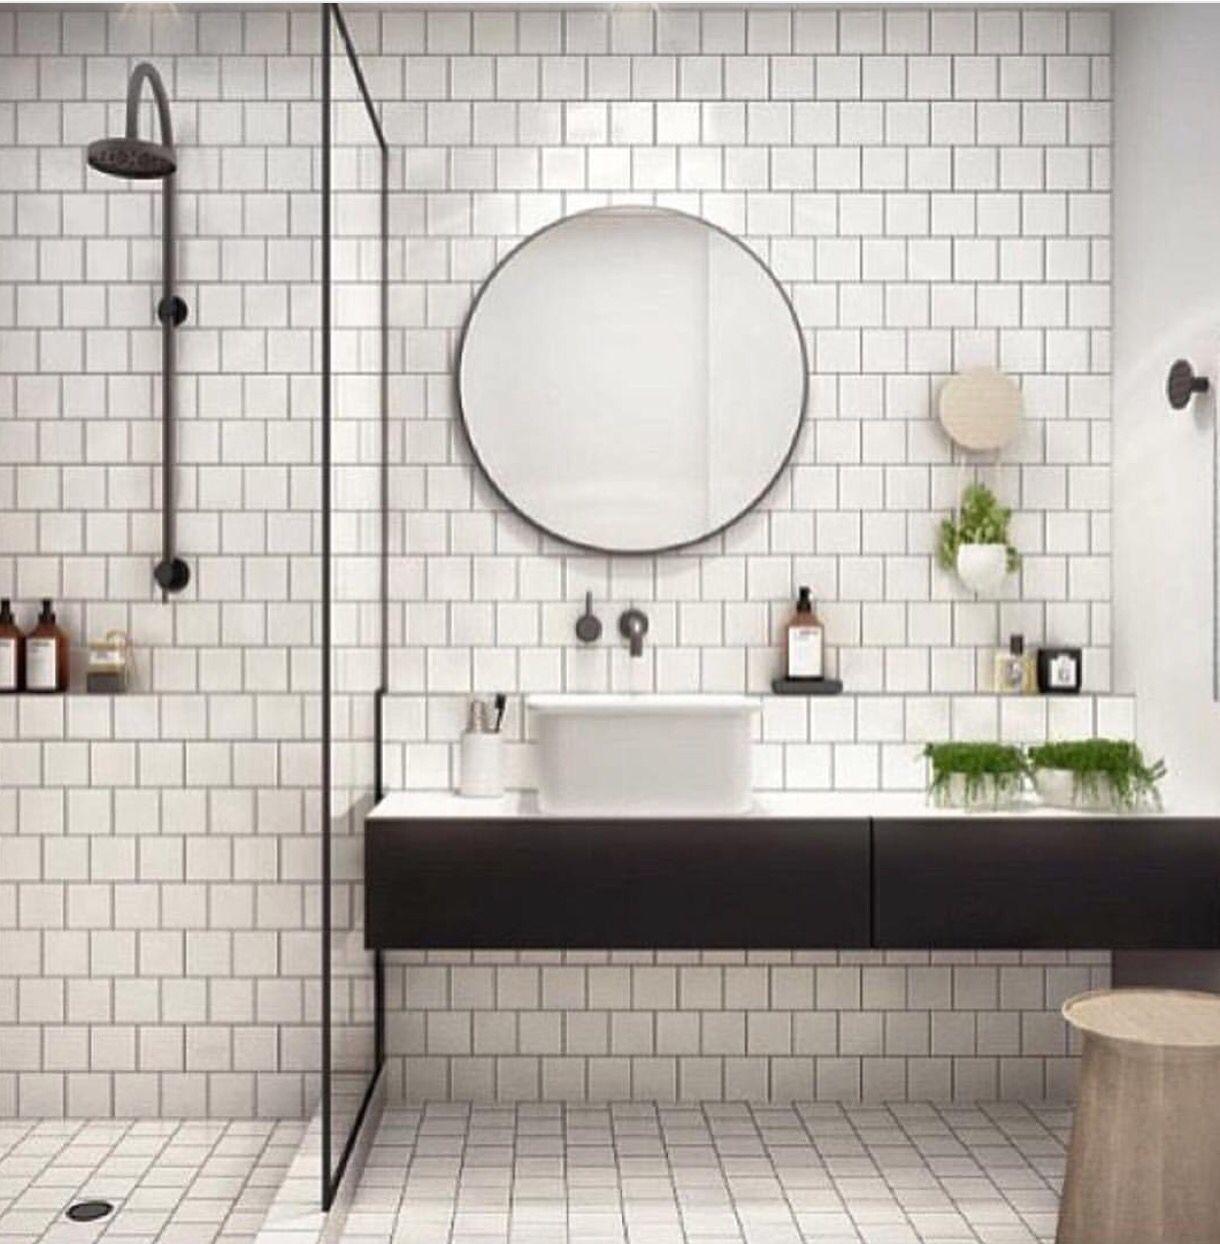 Bathroom ledge | Bathroom Remodel | Pinterest